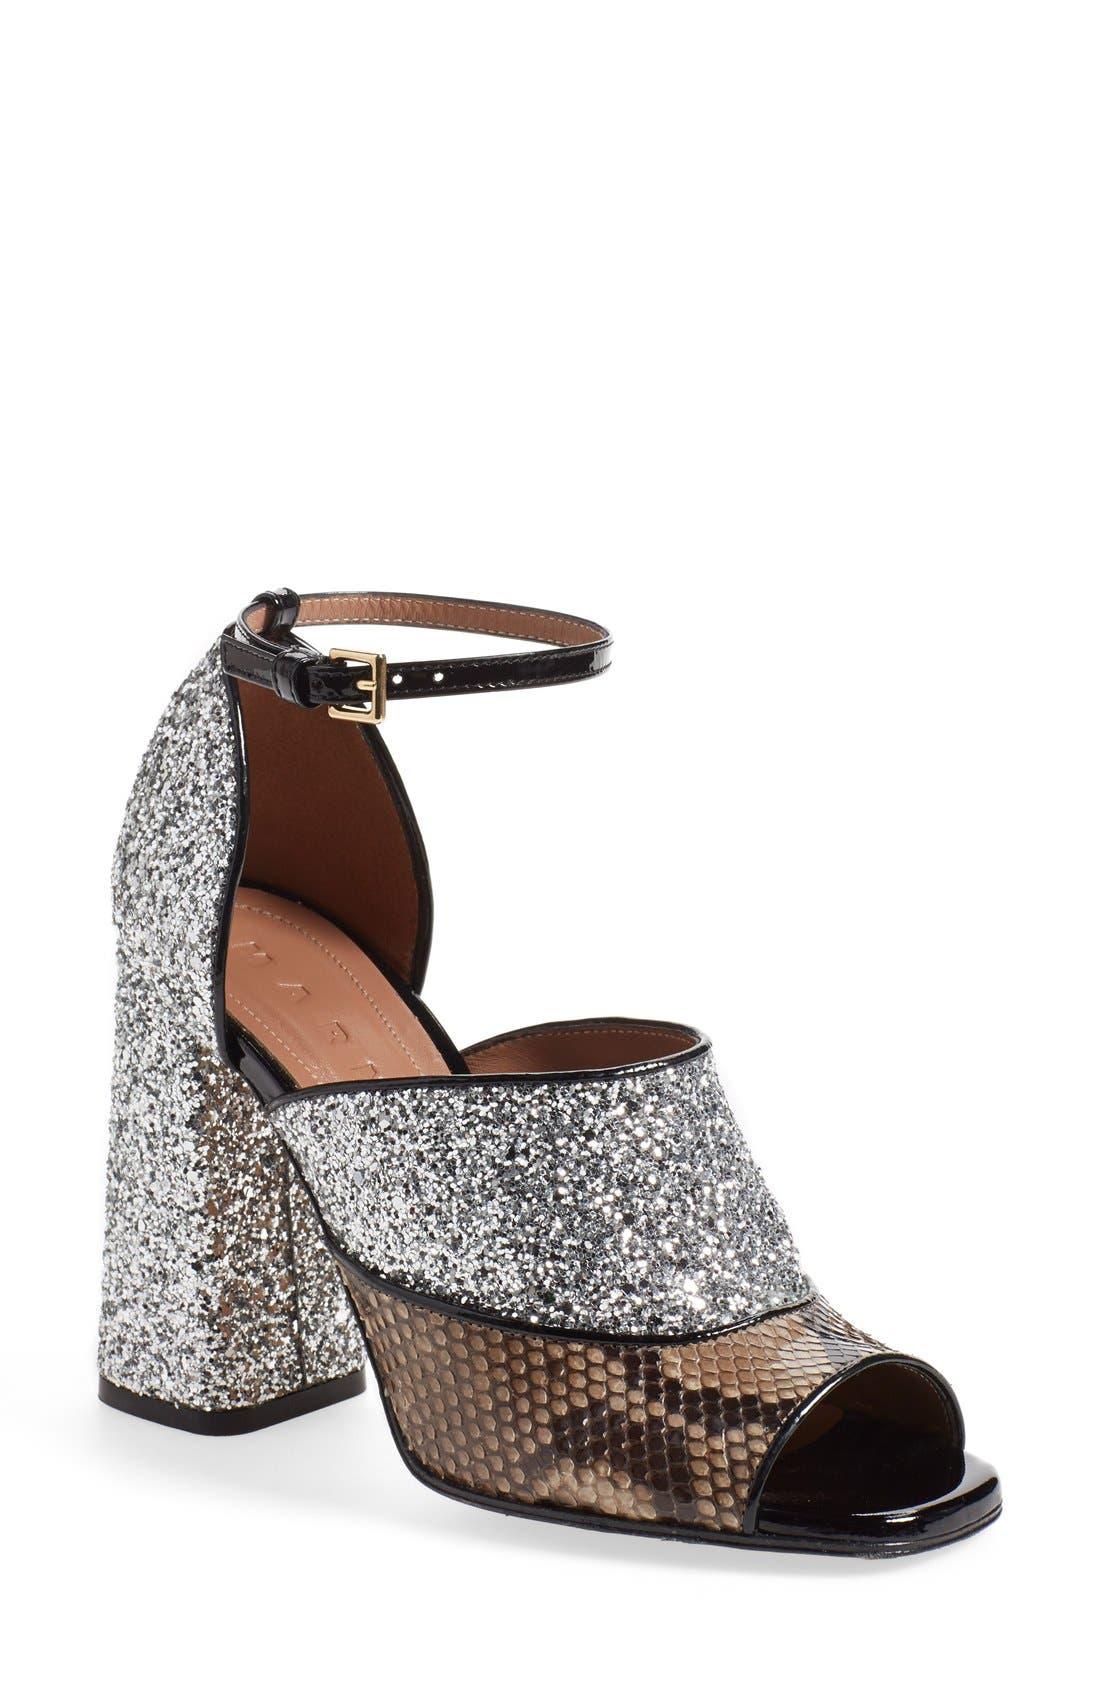 Alternate Image 1 Selected - Marni Peep Toe Chunky Genuine Python & Glitter Sandal (Women)